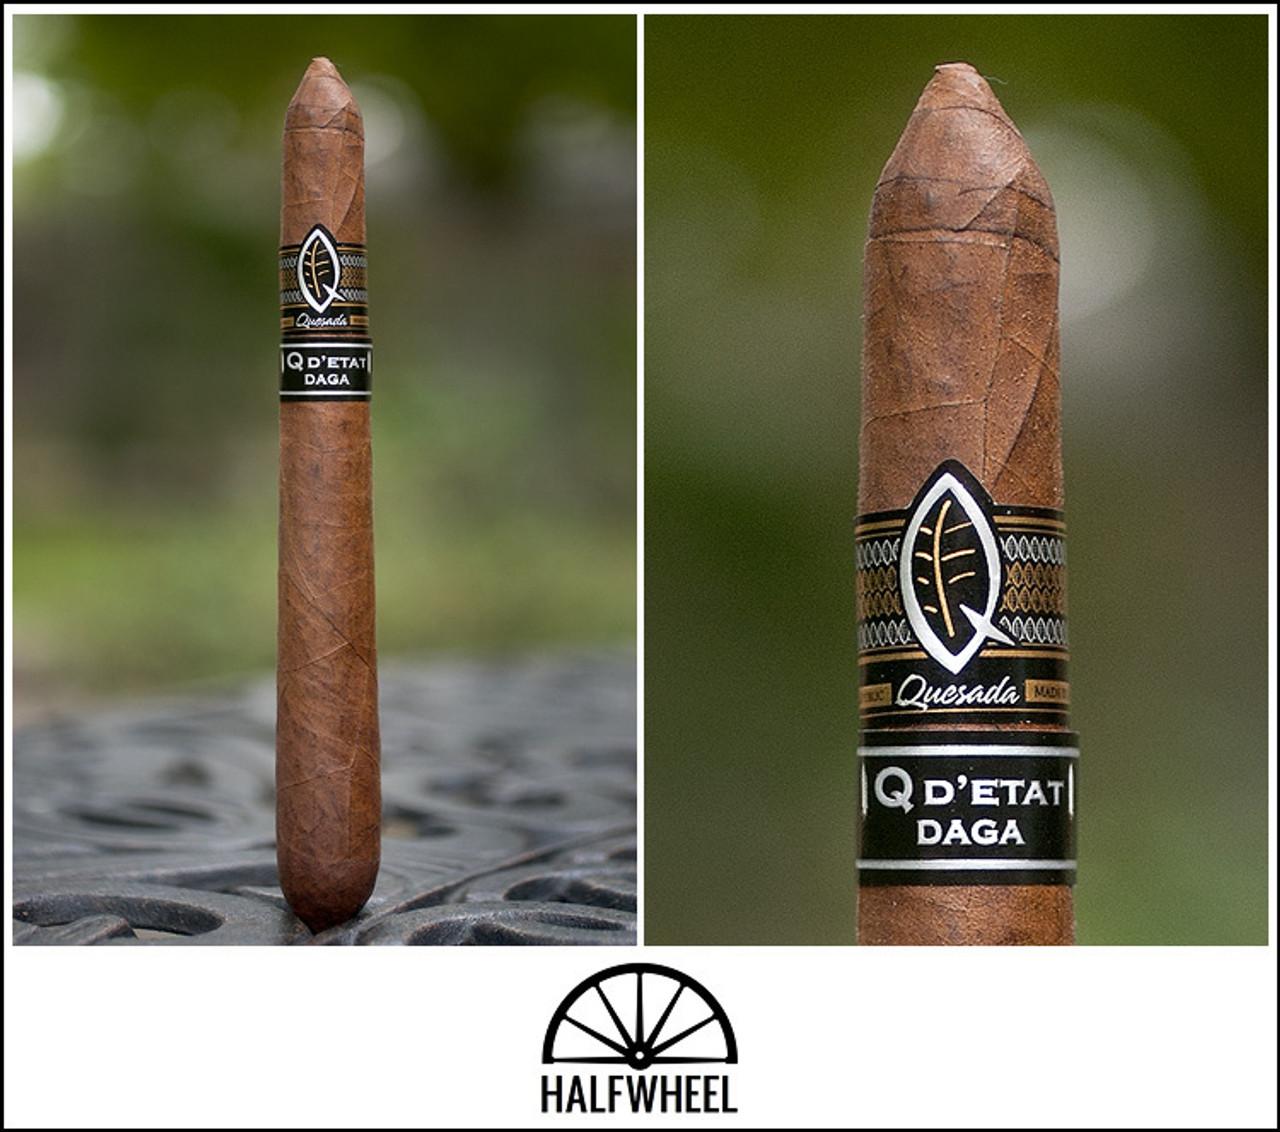 Quesada Q D'Etat Daga Cigars - 7.5 x 54 (Box of 10)